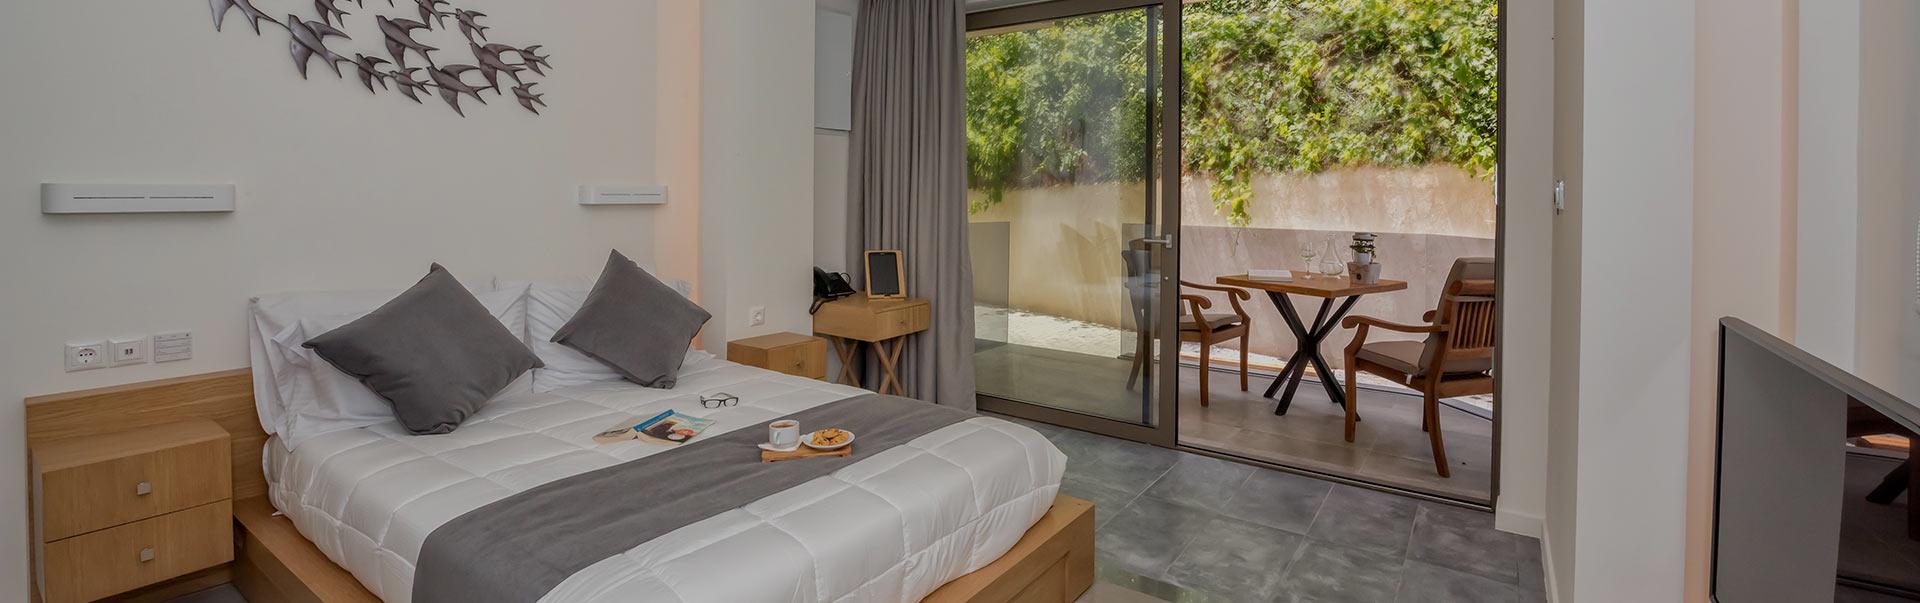 Standard-suite-gardenview-wbd2